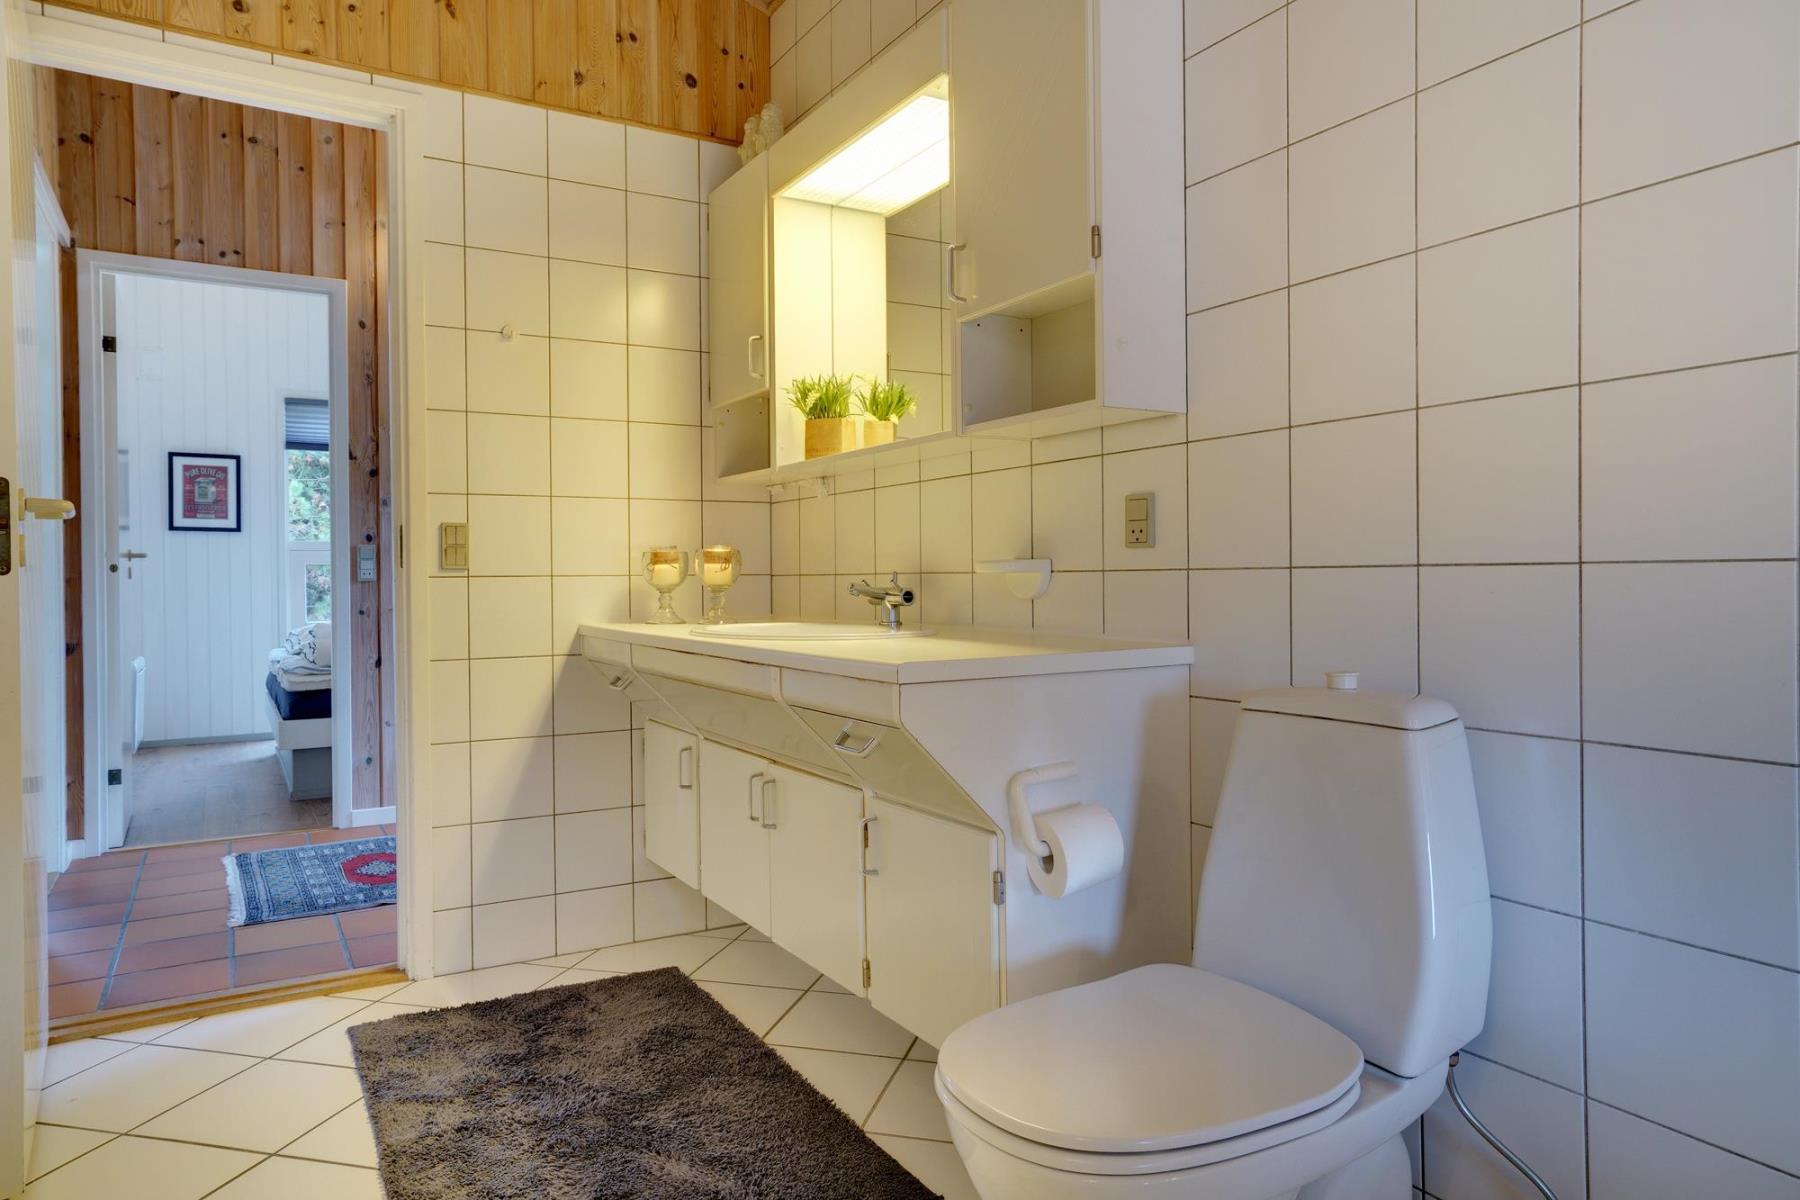 Ferienhaus 1407 - Blåbærvej 13